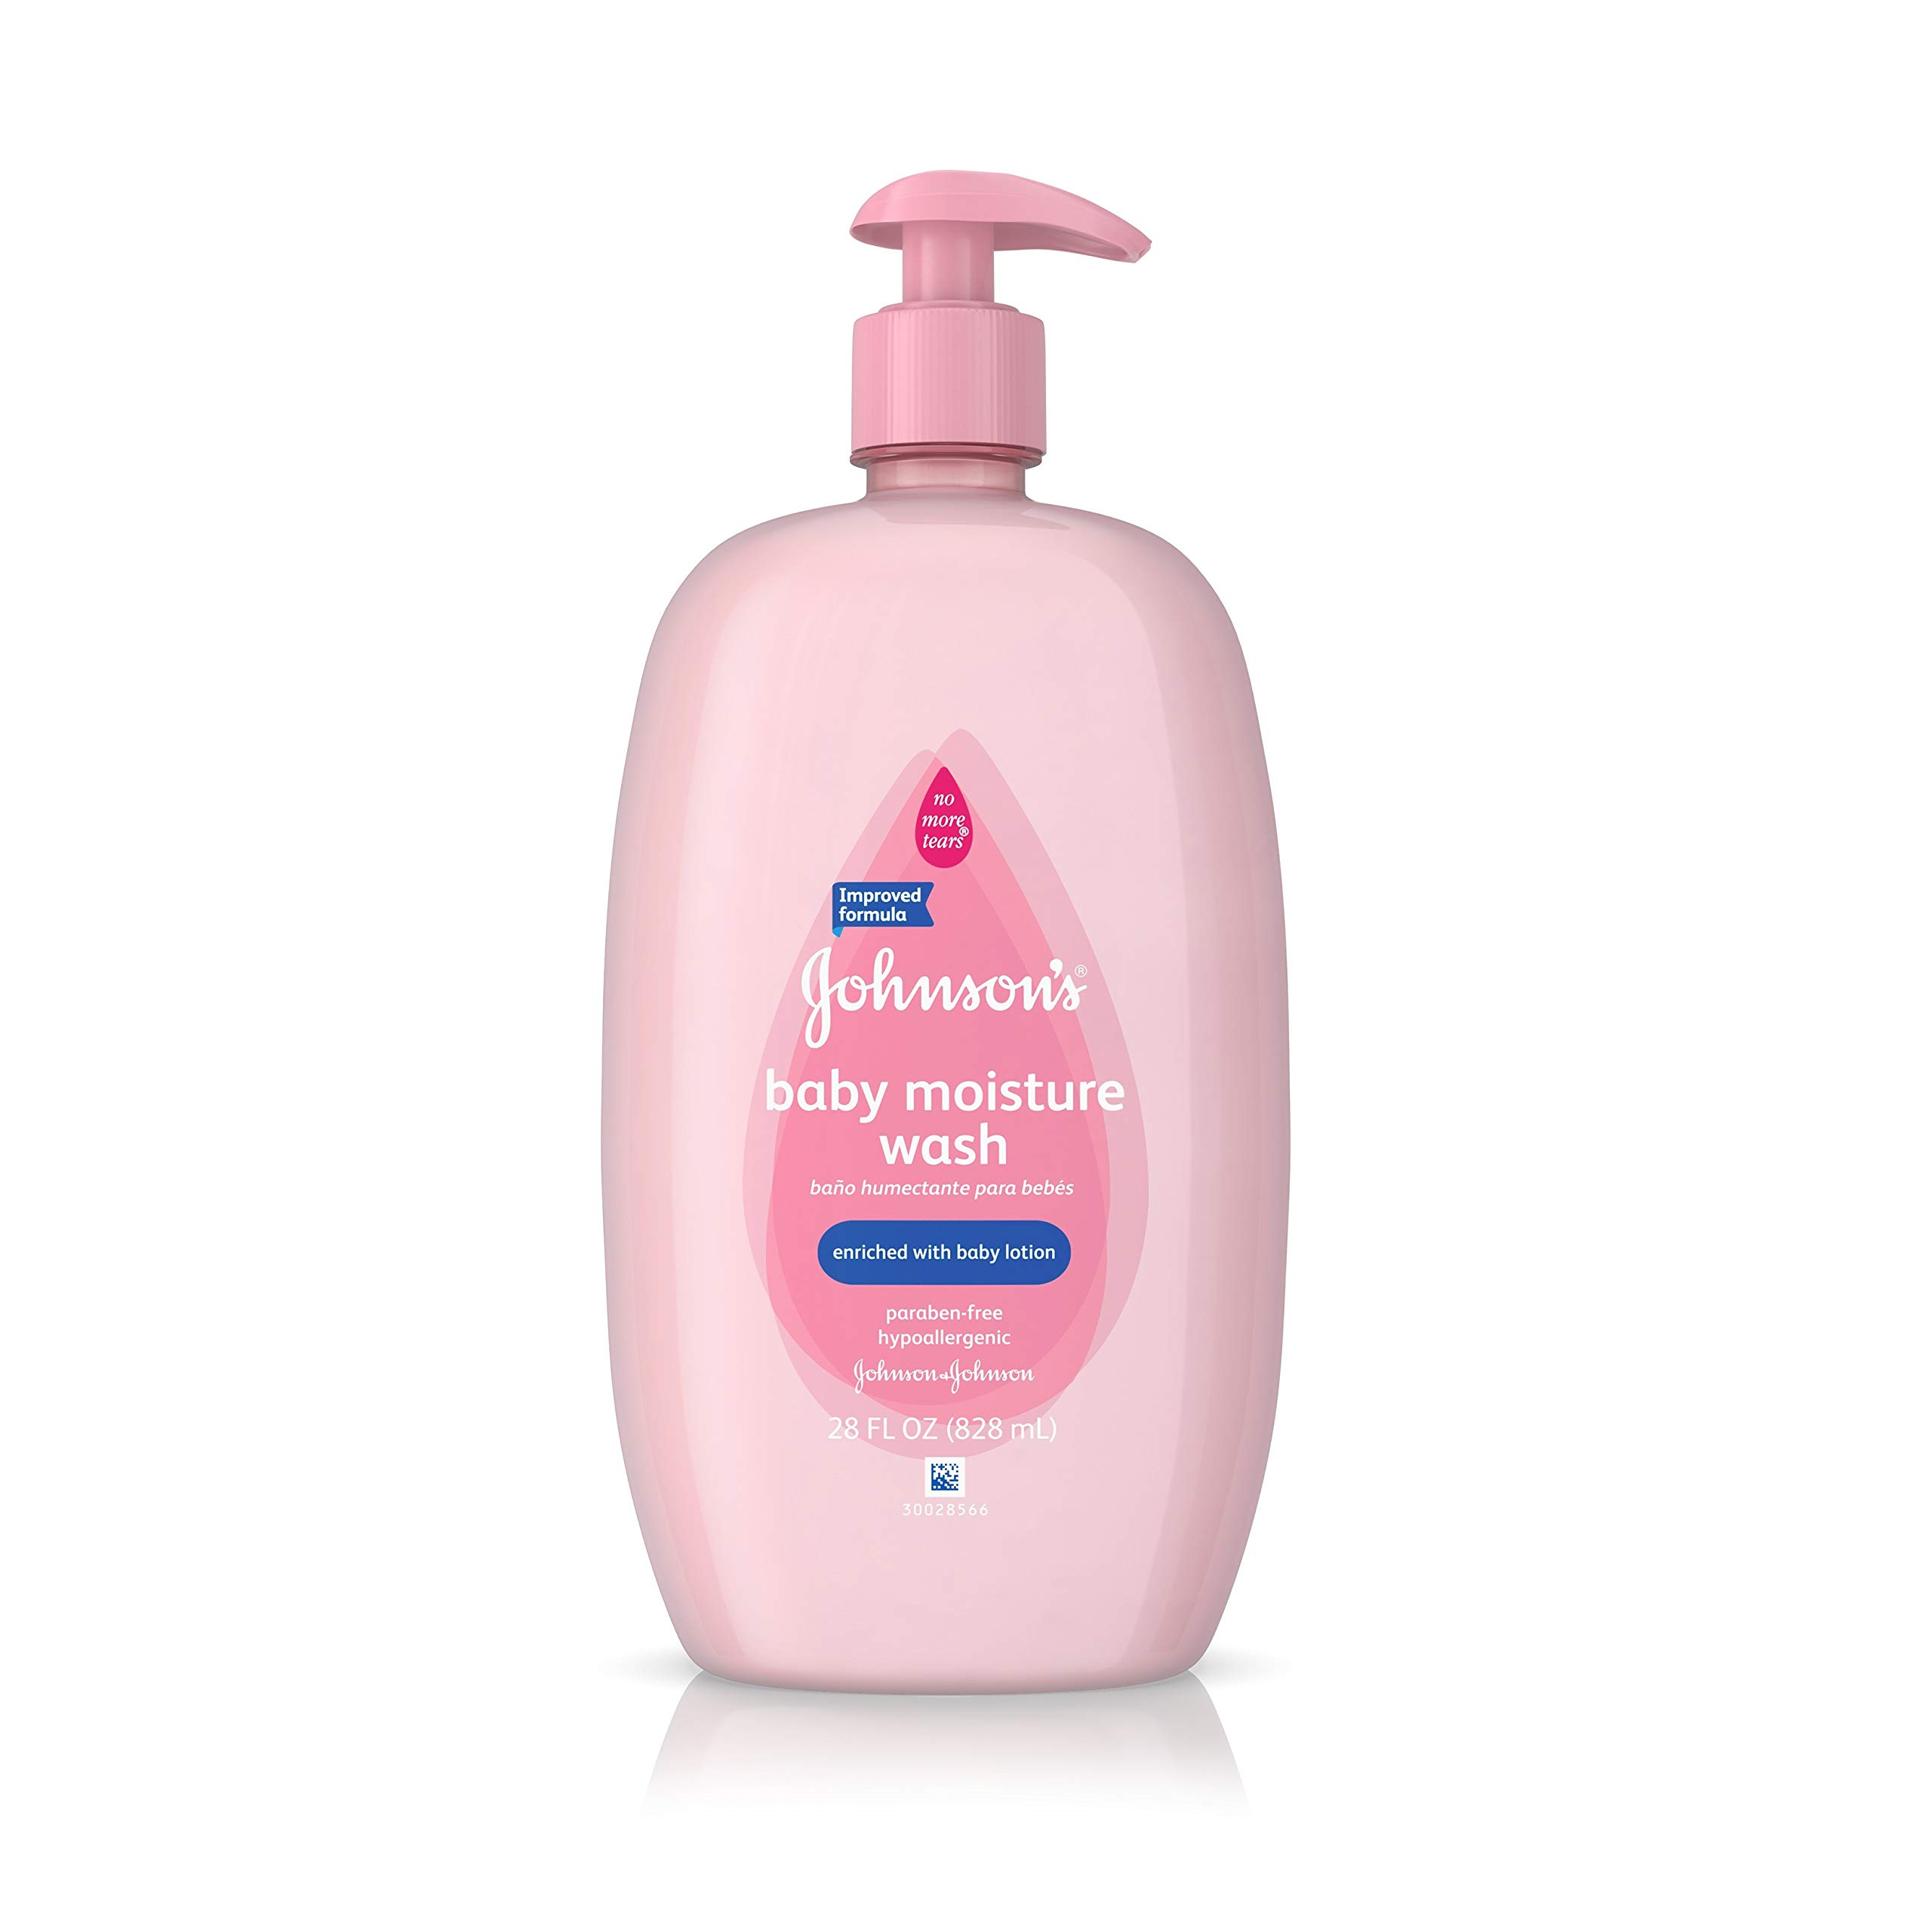 Johnson's Baby Moisture Care Wash To Soften Skin, 28 Oz. by Johnson's Baby